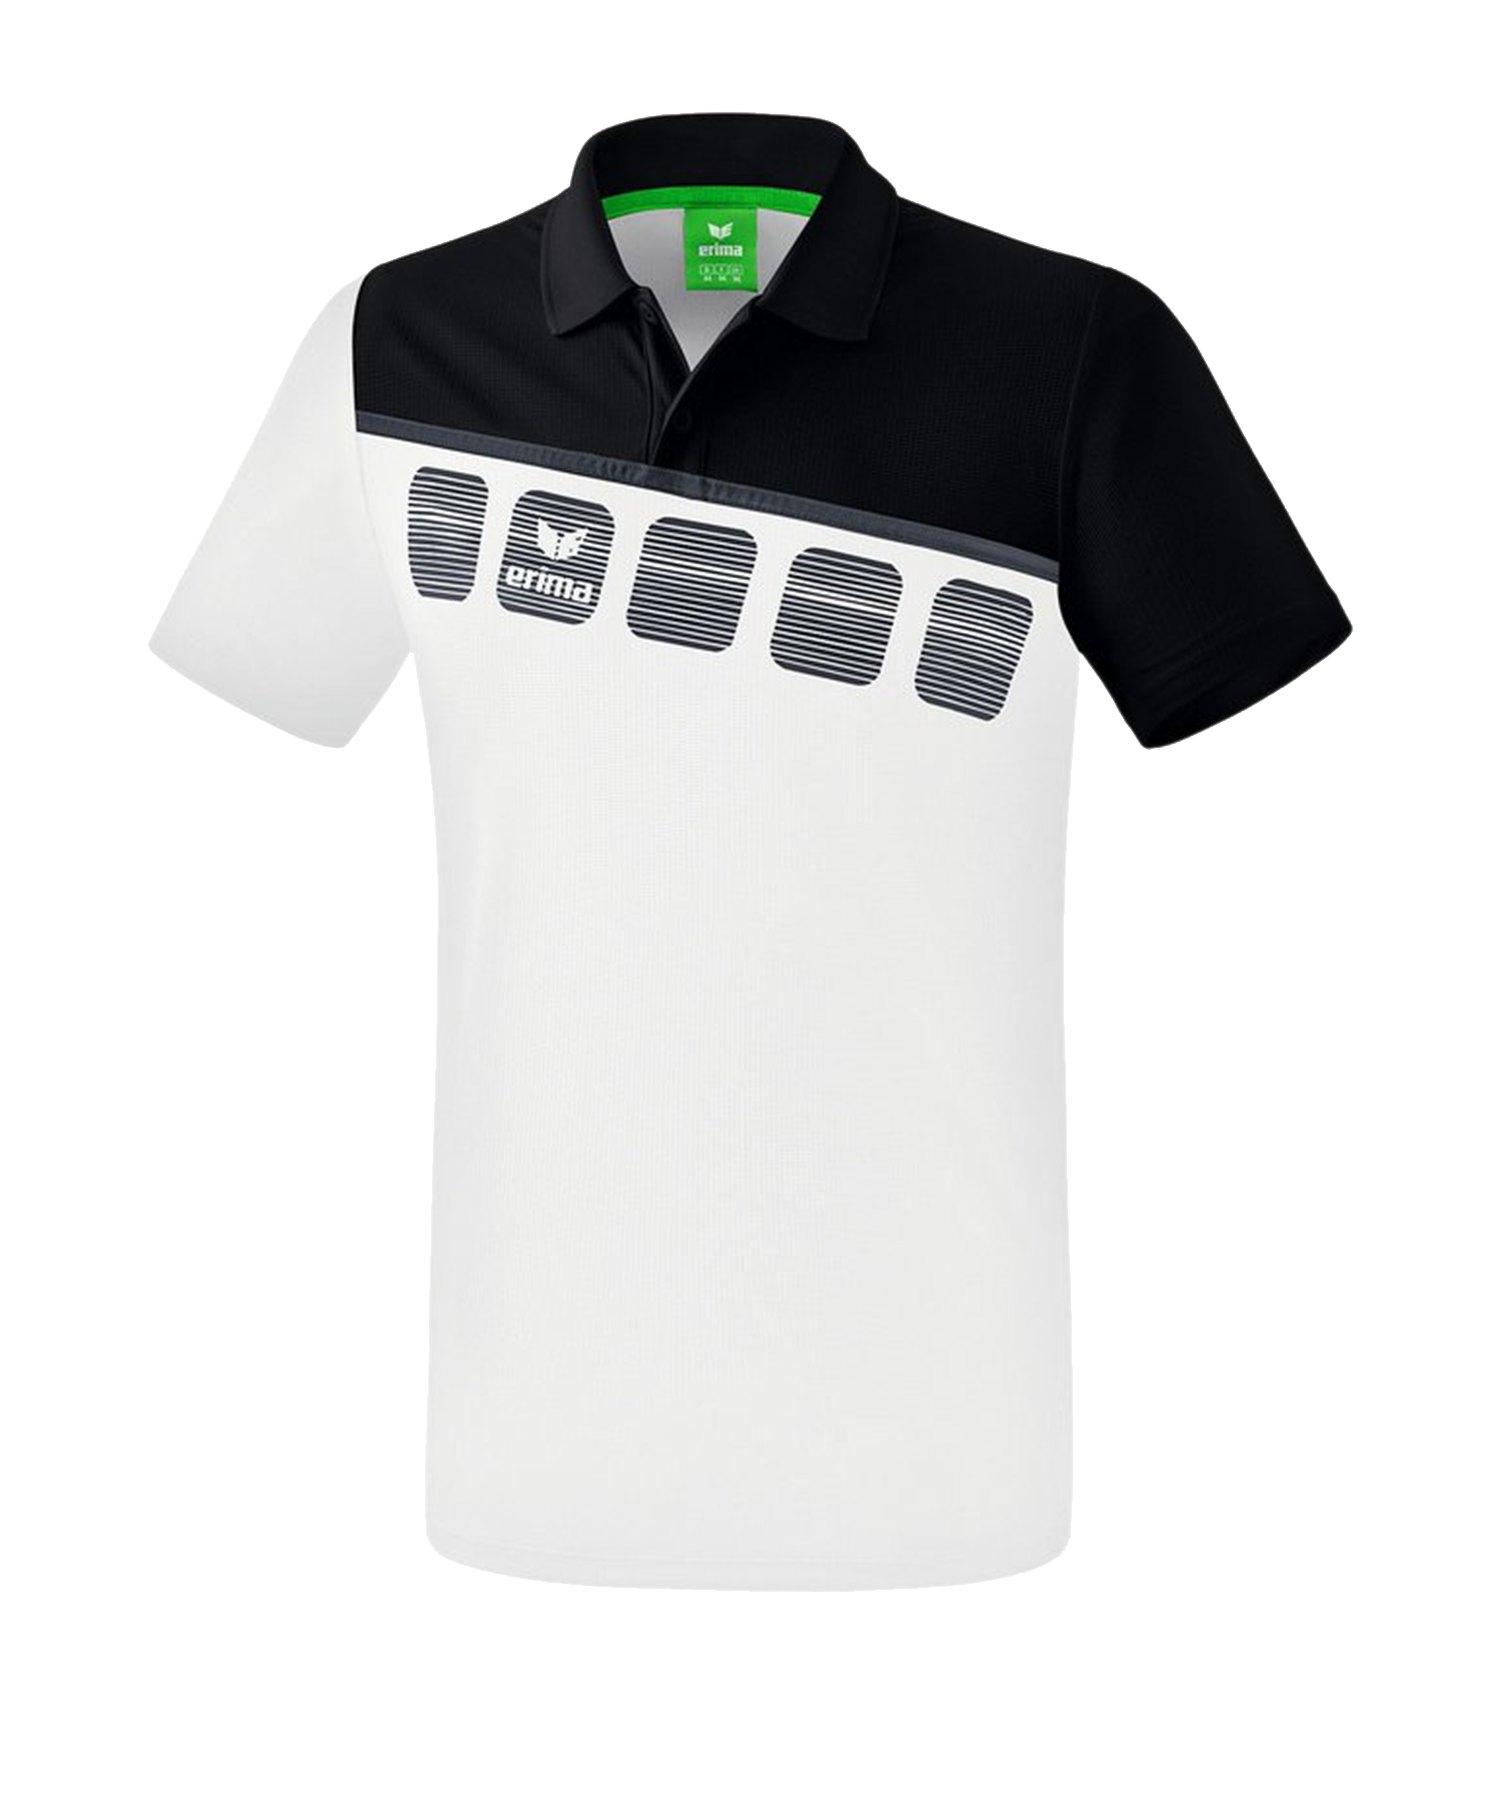 Erima 5-C Poloshirt Weiss Schwarz - Weiss